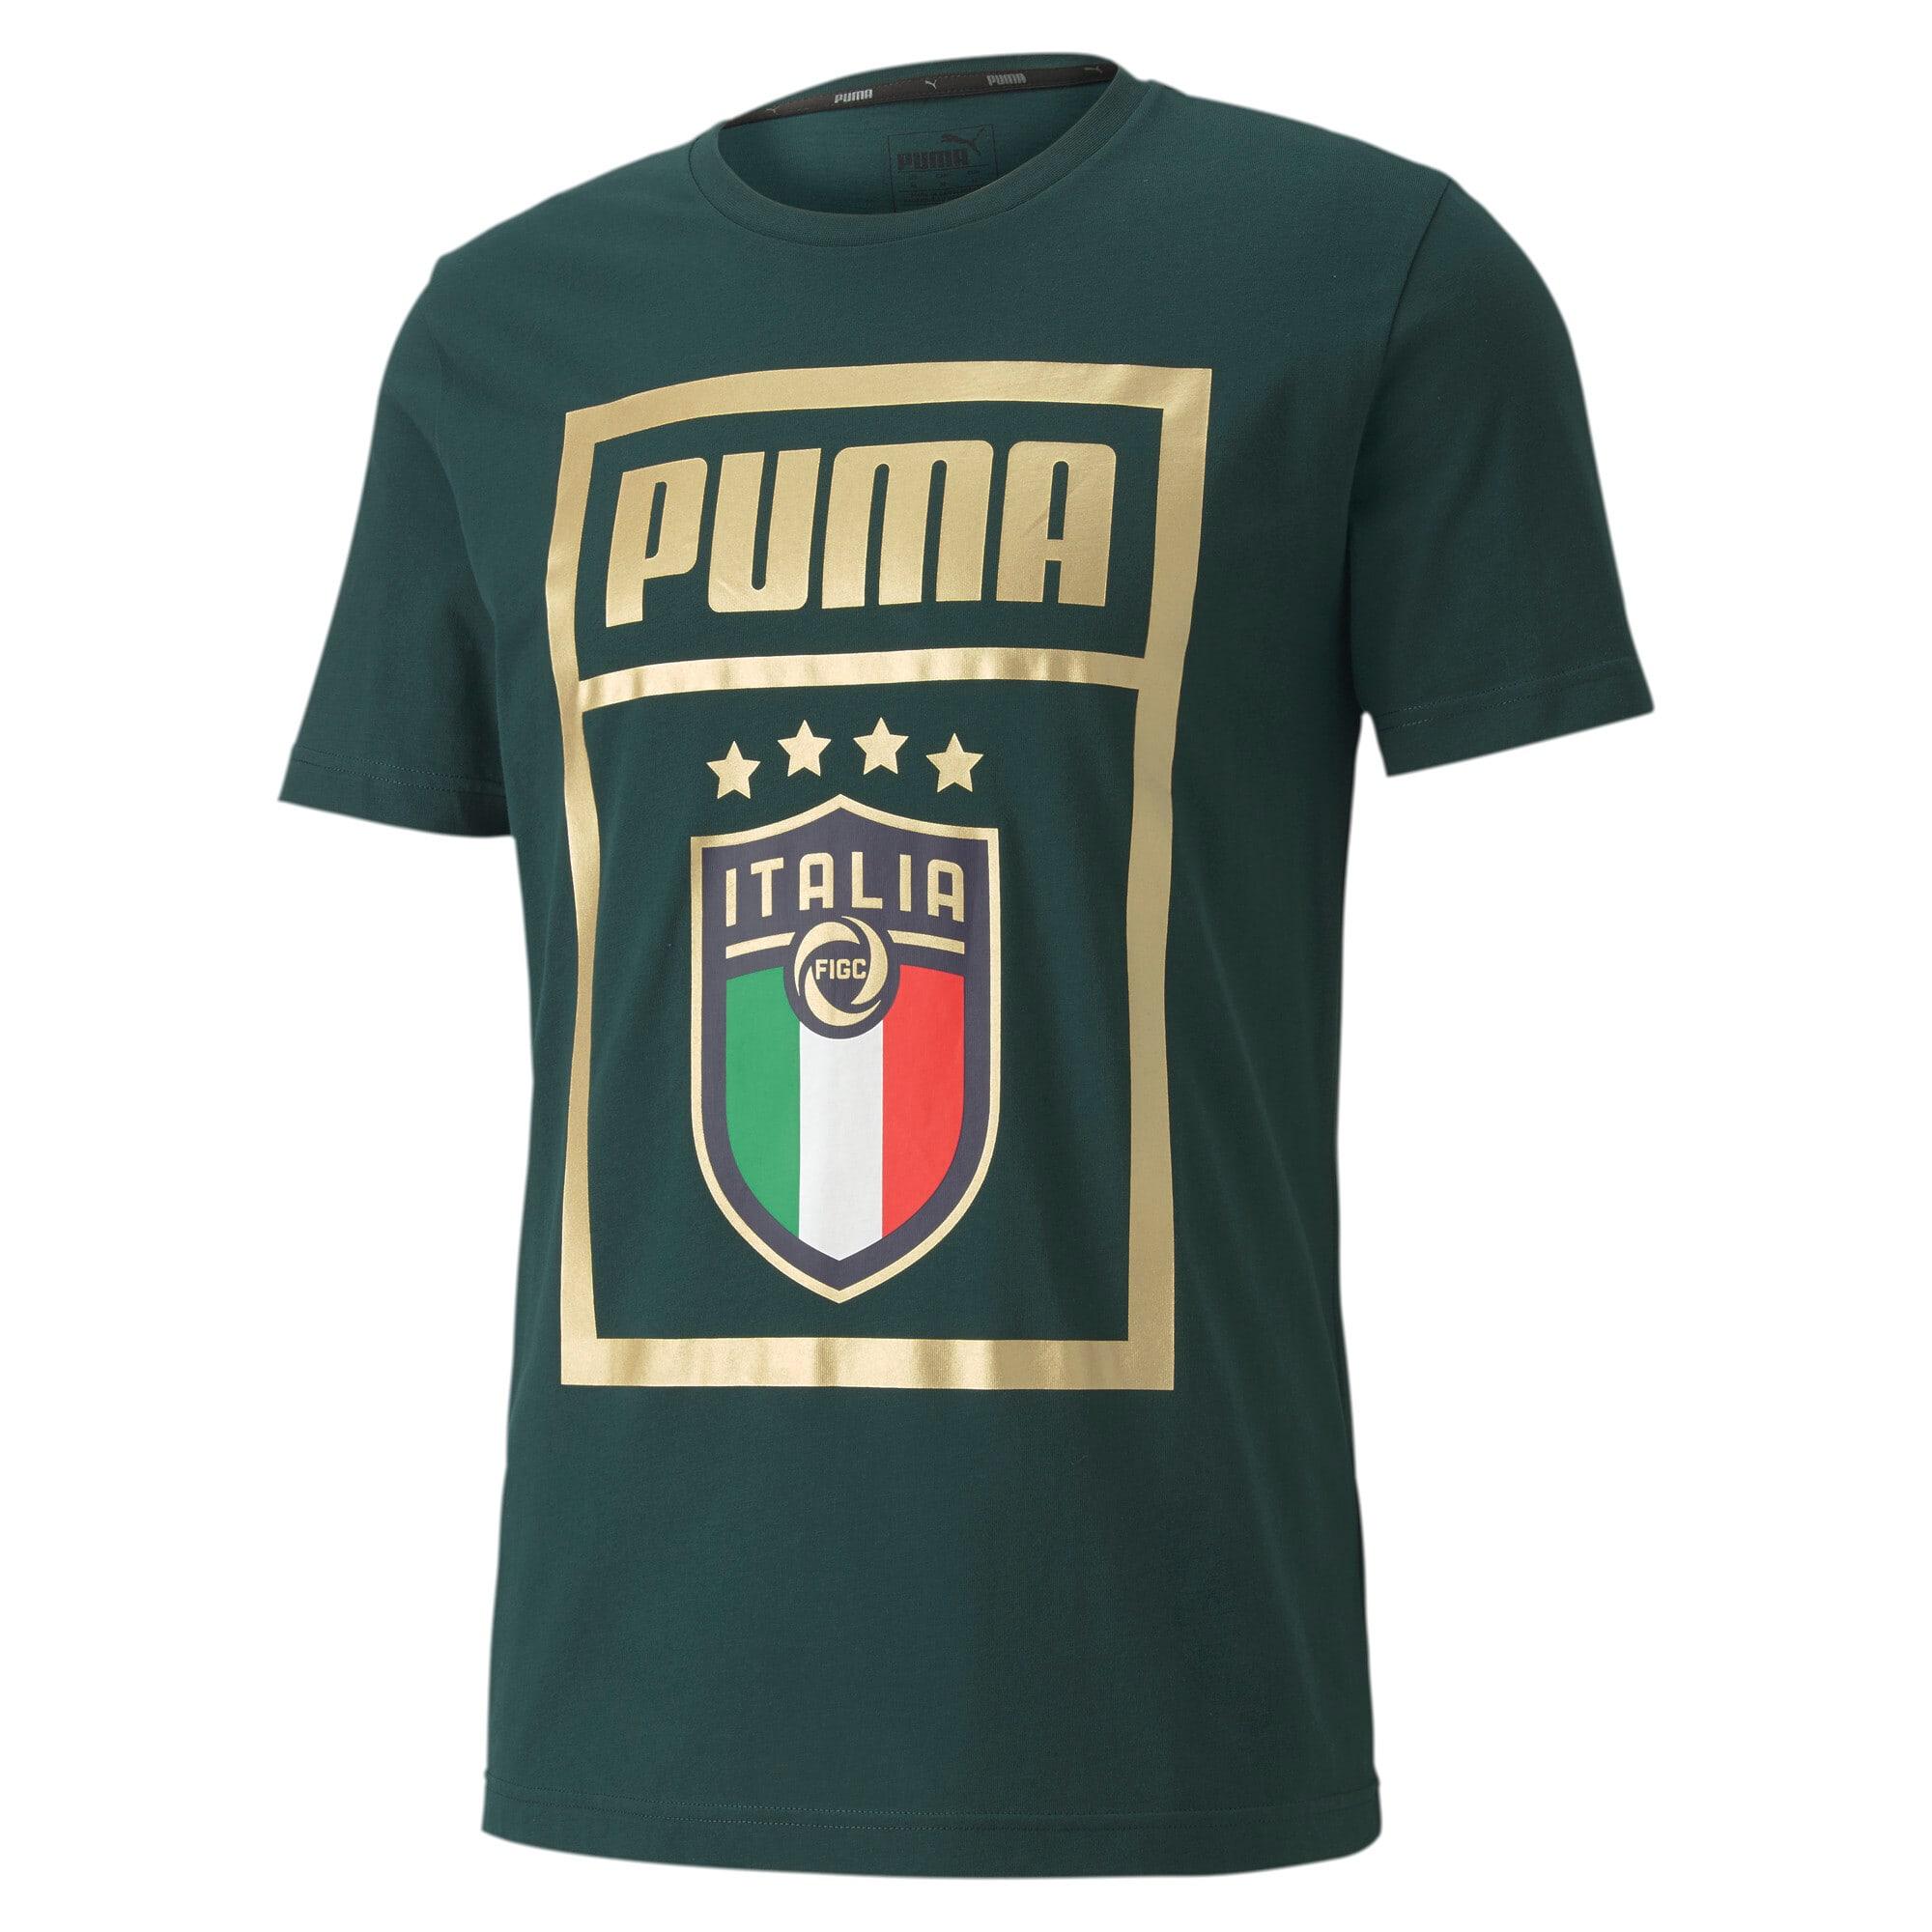 Thumbnail 1 of FIGC イタリア PUMA DNA Tシャツ 半袖, Ponderosa Pine-Team gold, medium-JPN